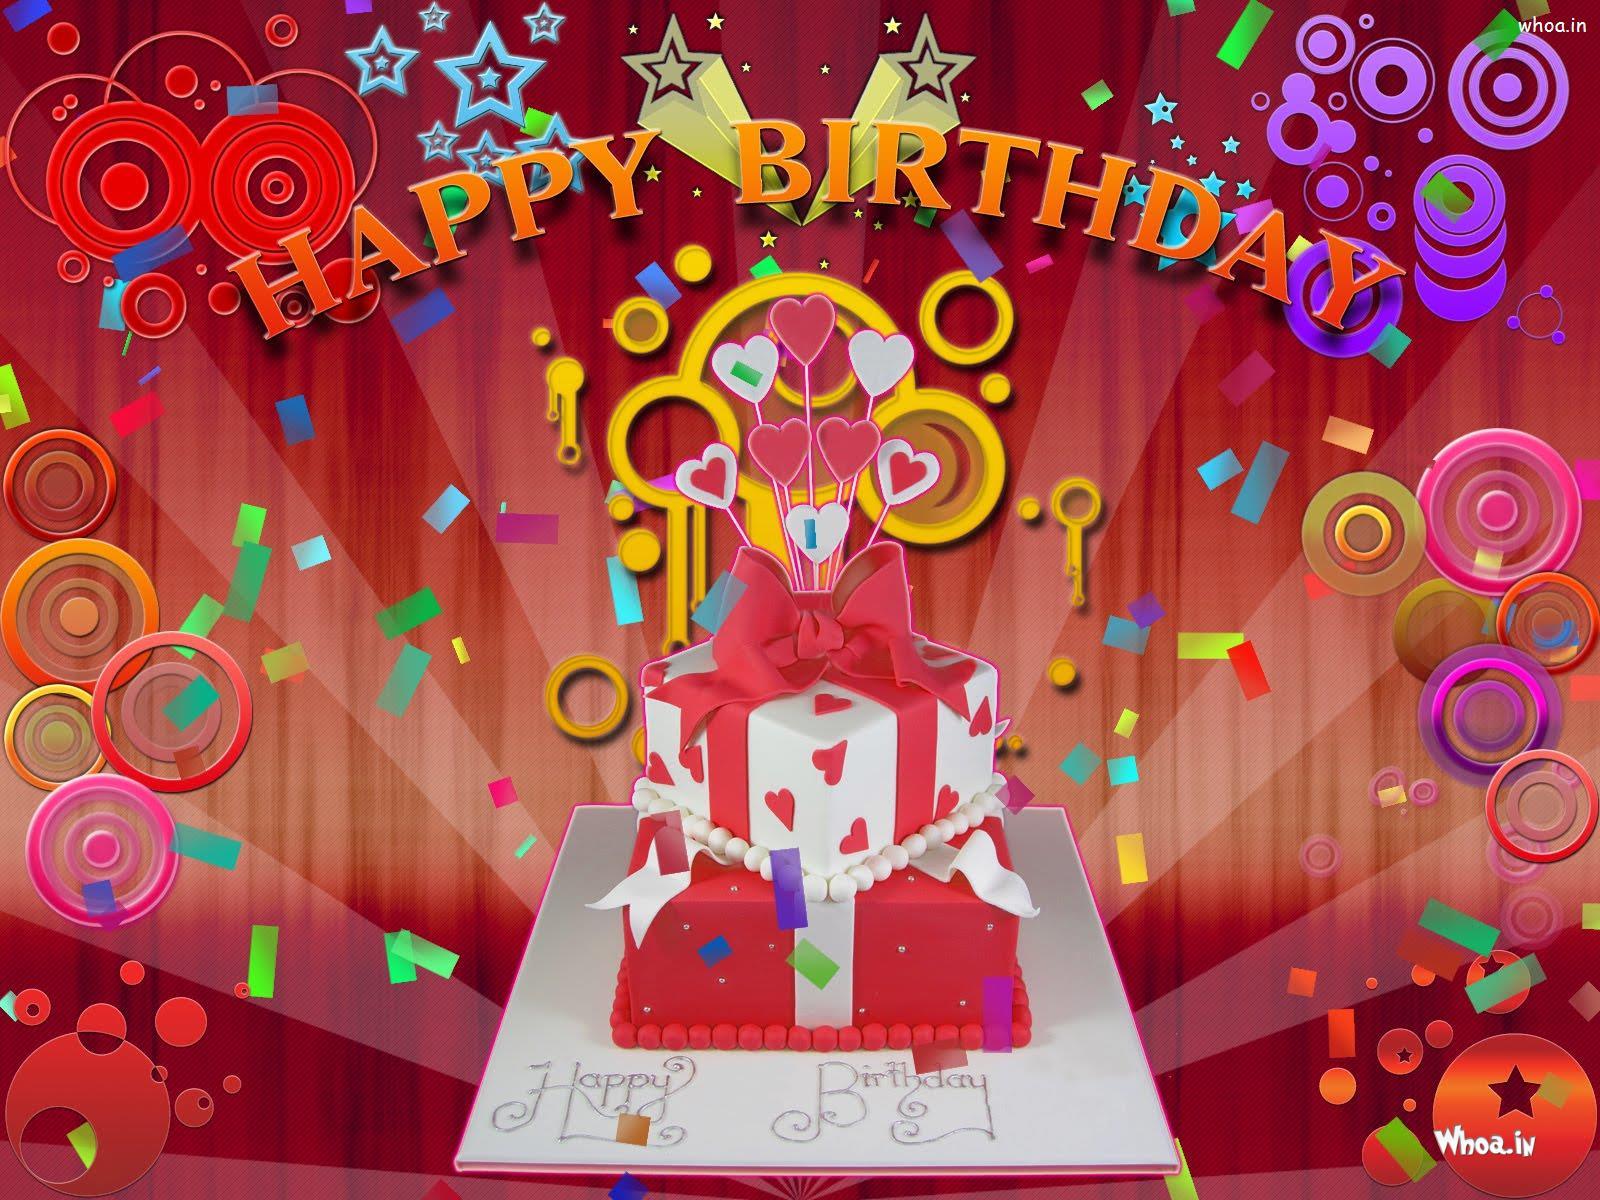 Happy Birthday Gift Red Background Wallpaper